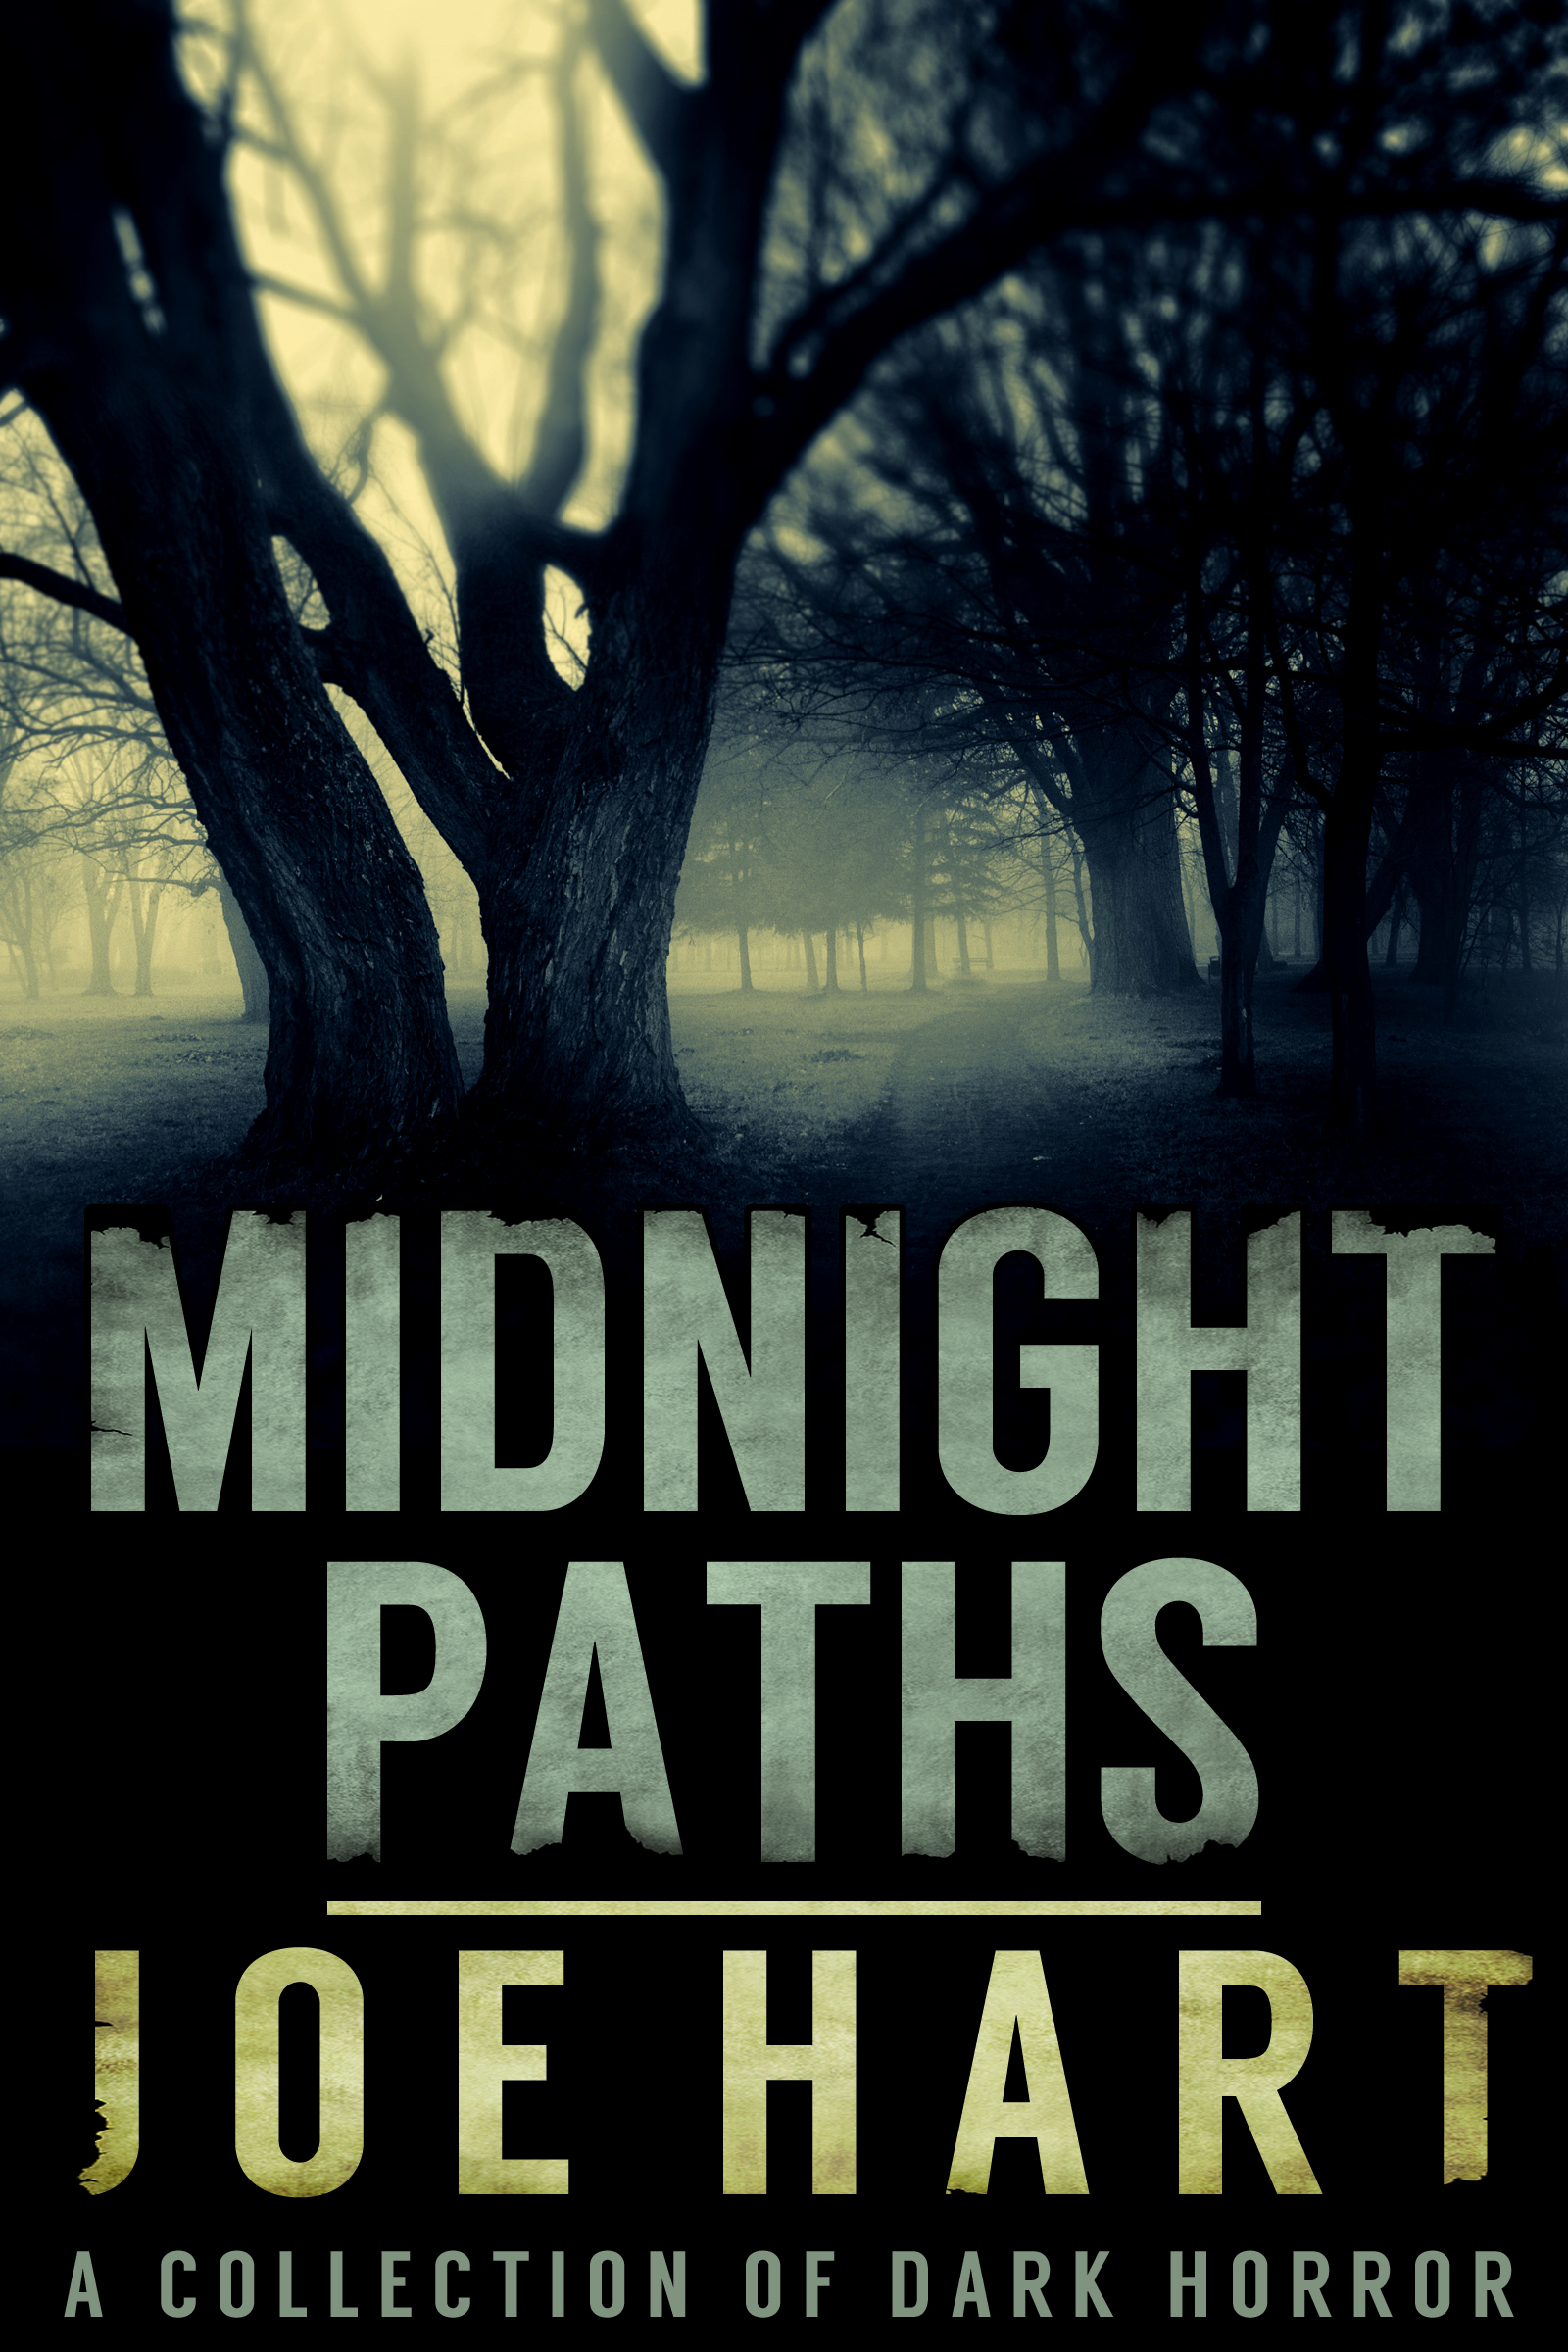 Midnight_Paths2-1.jpg